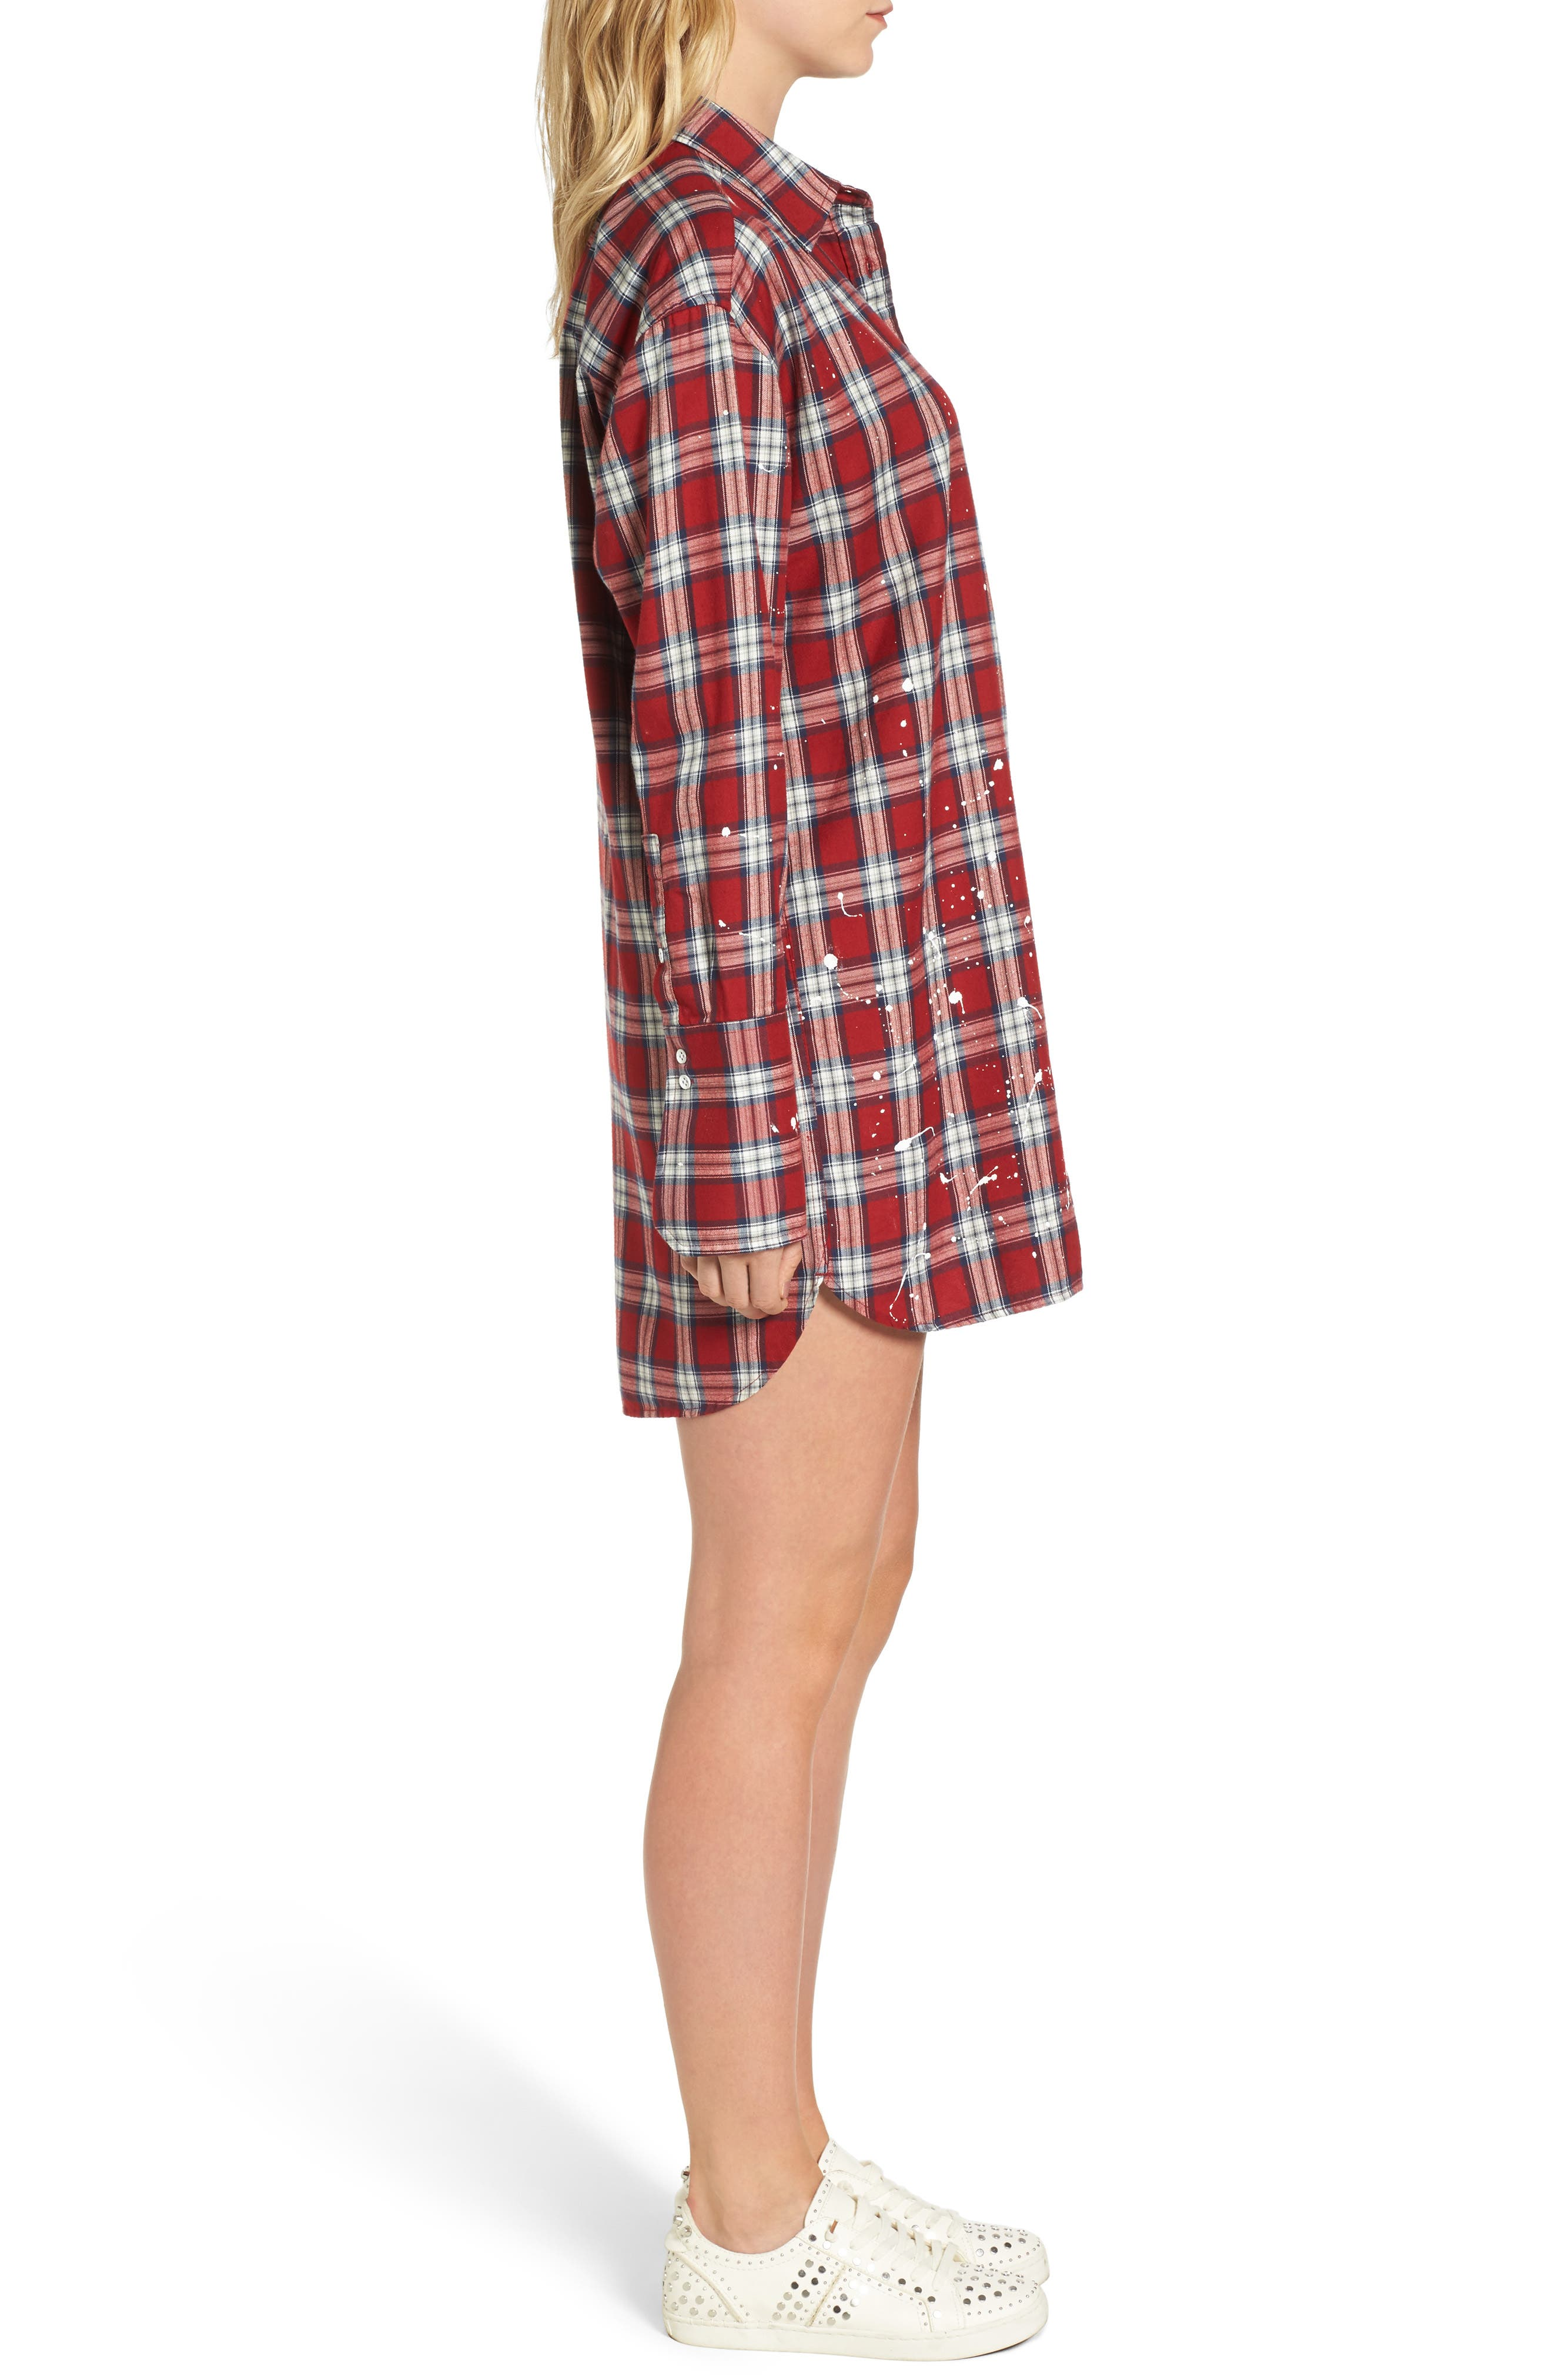 Rivington & Essex Plaid Shirtdress,                             Alternate thumbnail 3, color,                             609